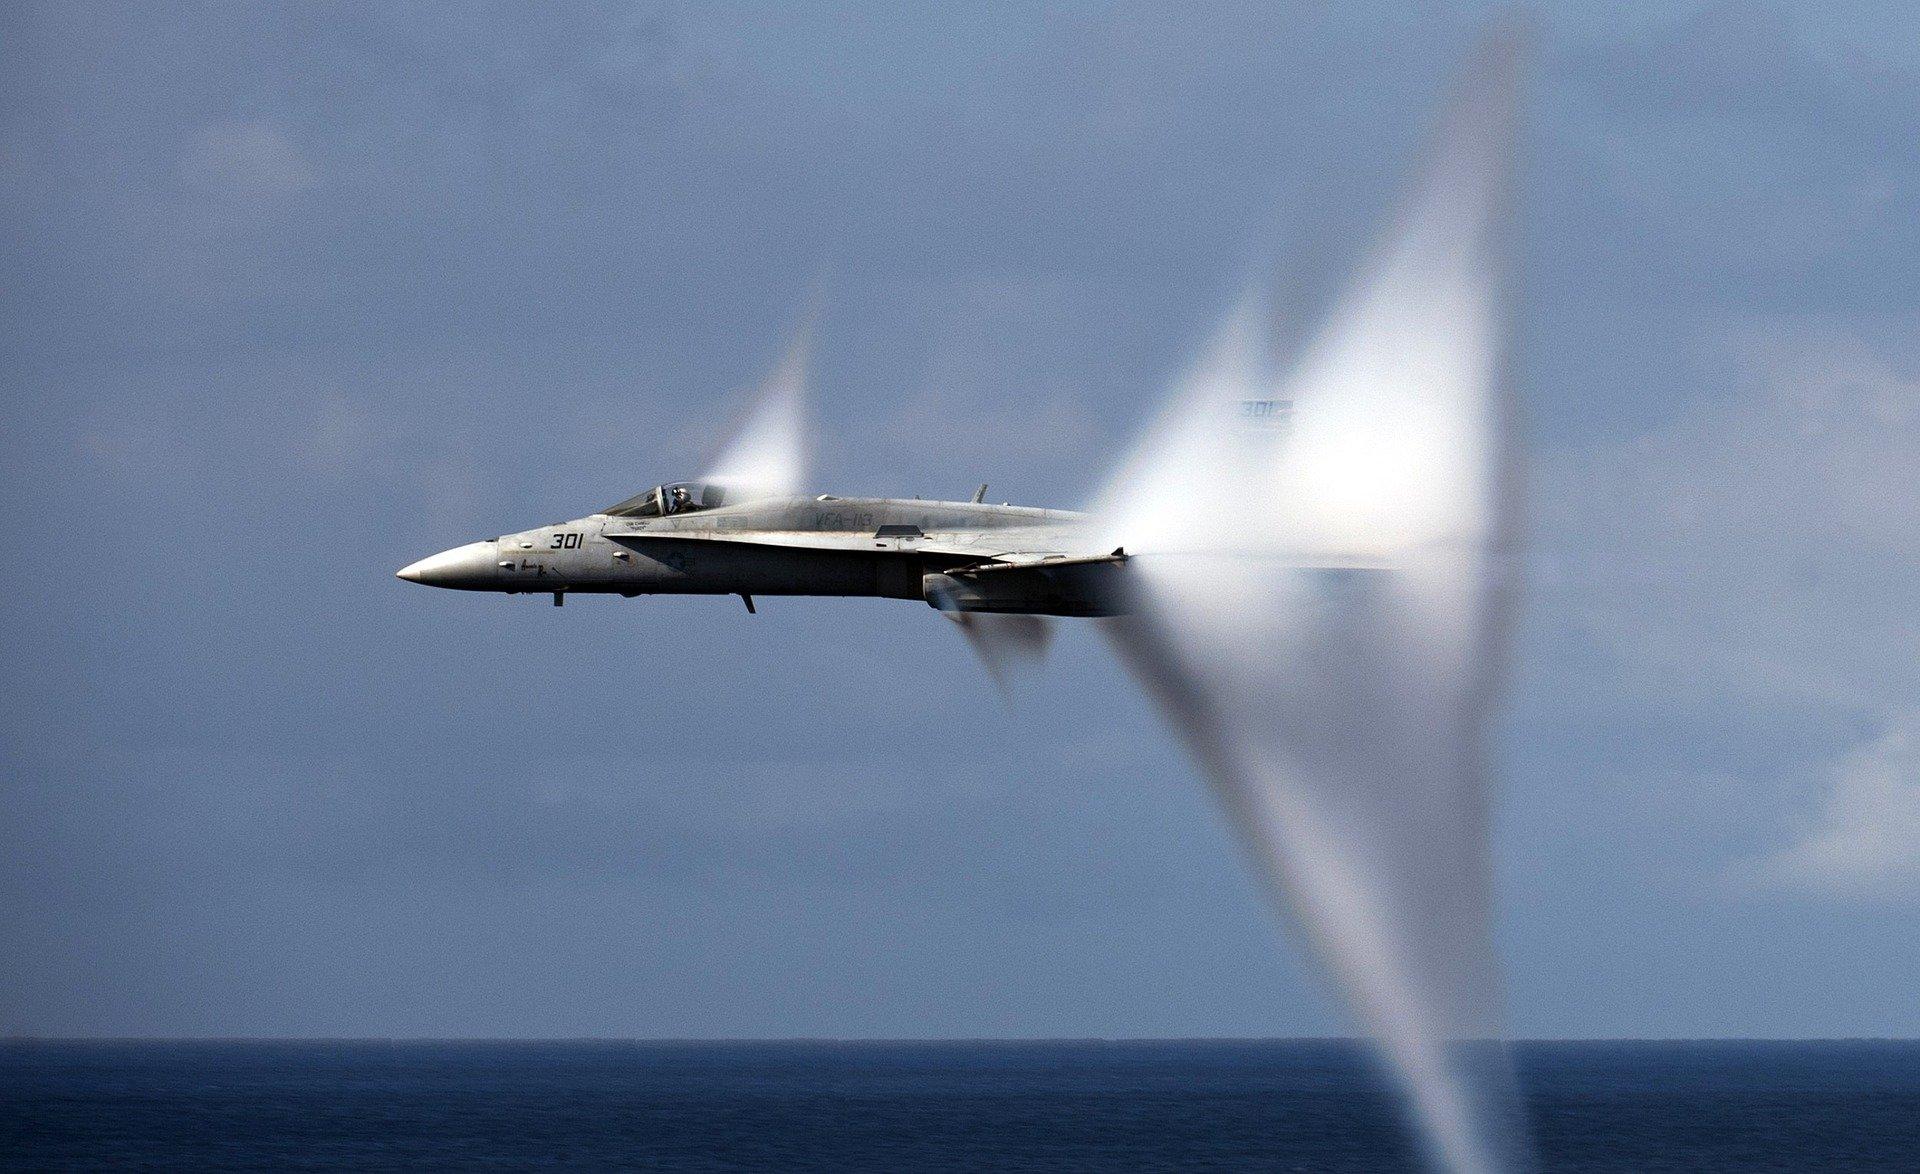 military-jet-1053394_1920